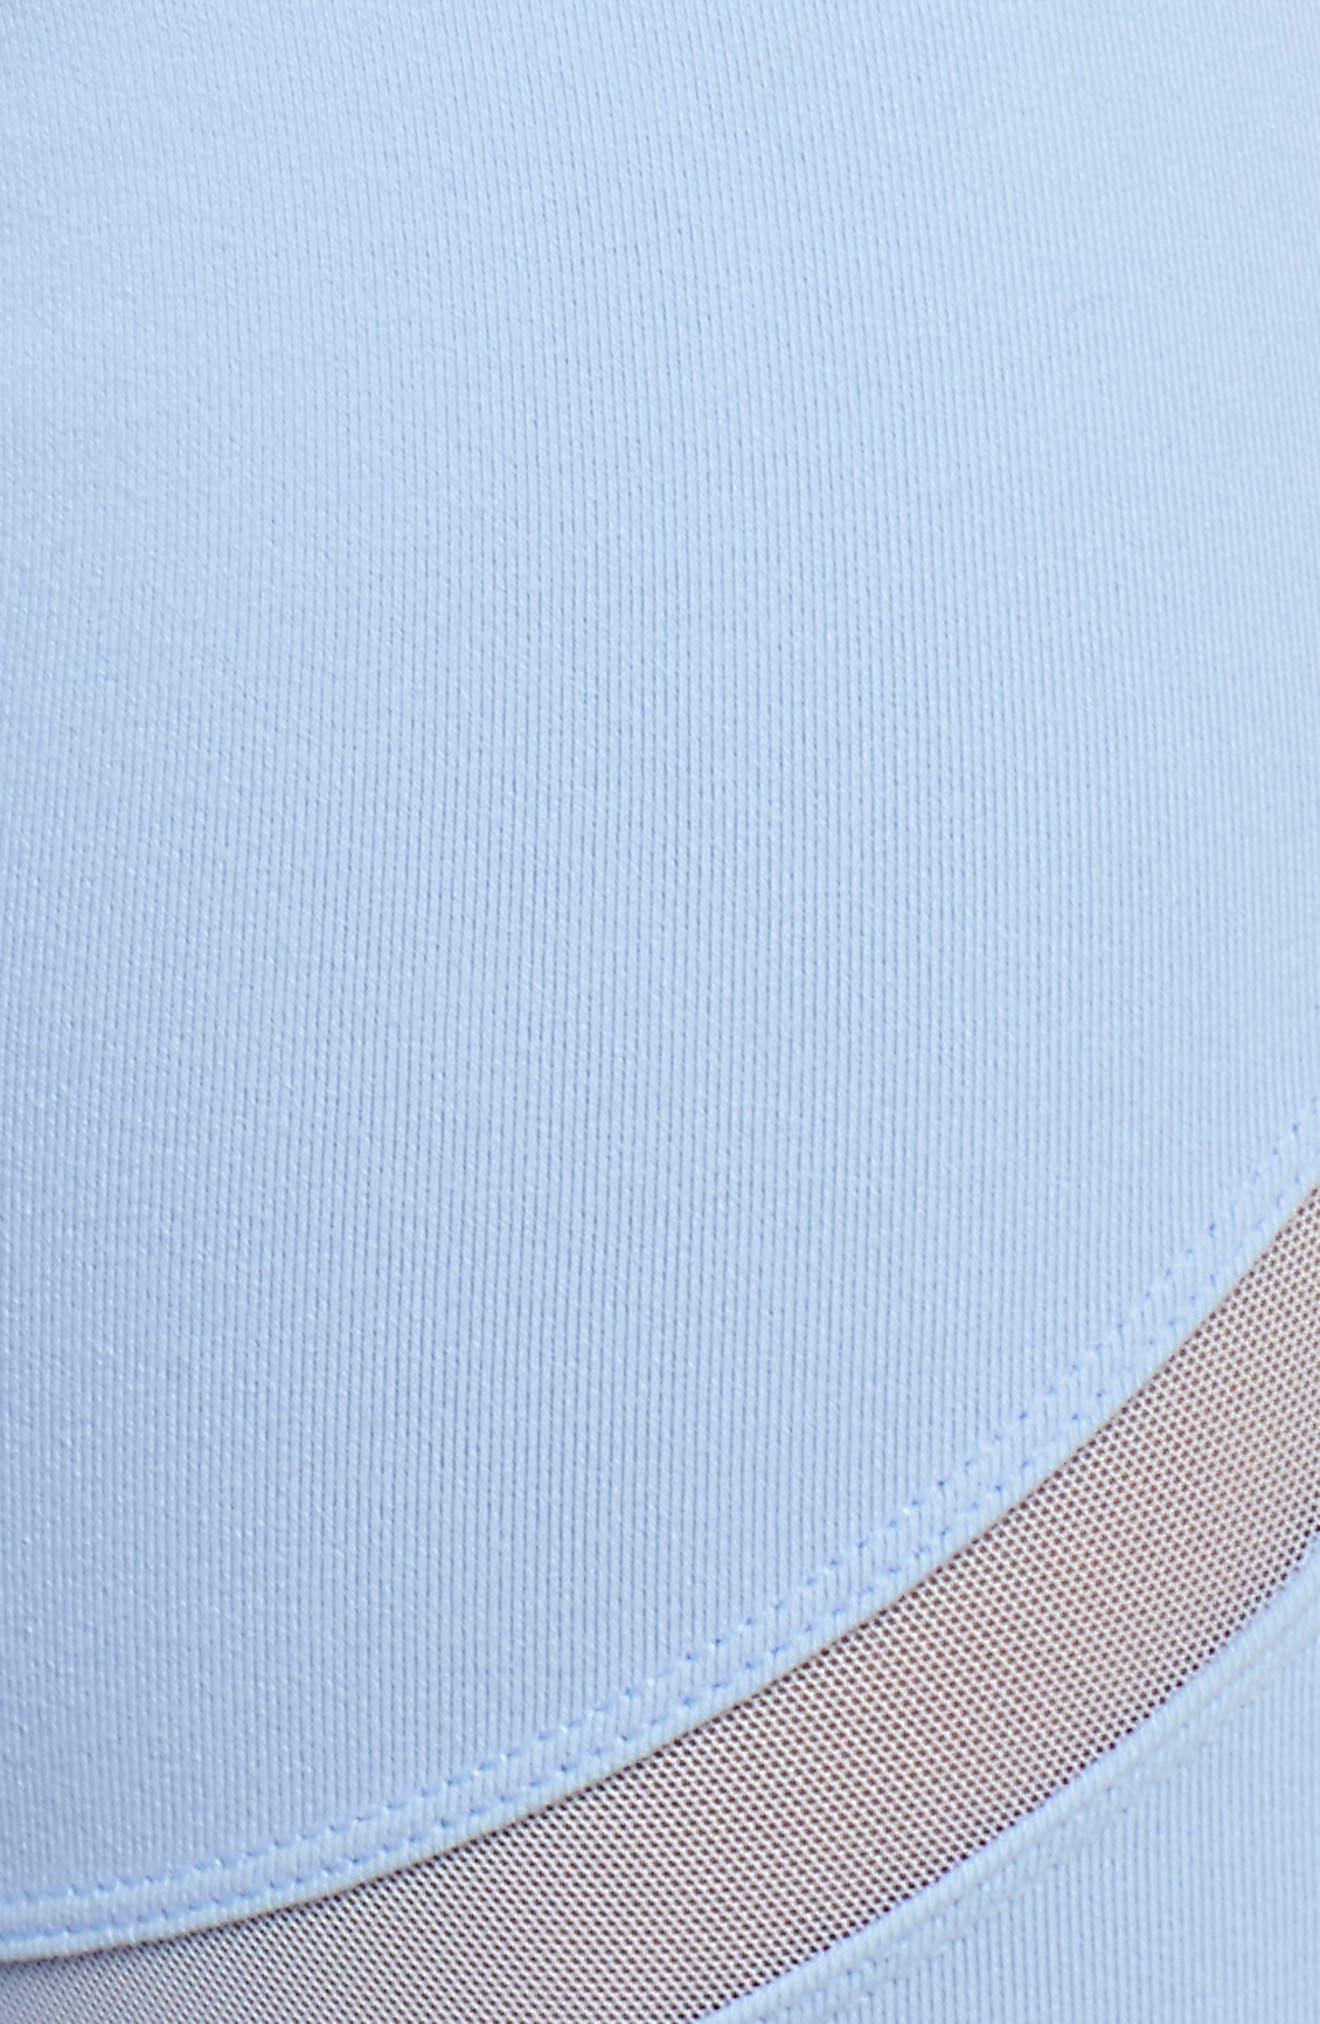 Laced High Waist Capri Leggings,                             Alternate thumbnail 6, color,                             Uv Blue